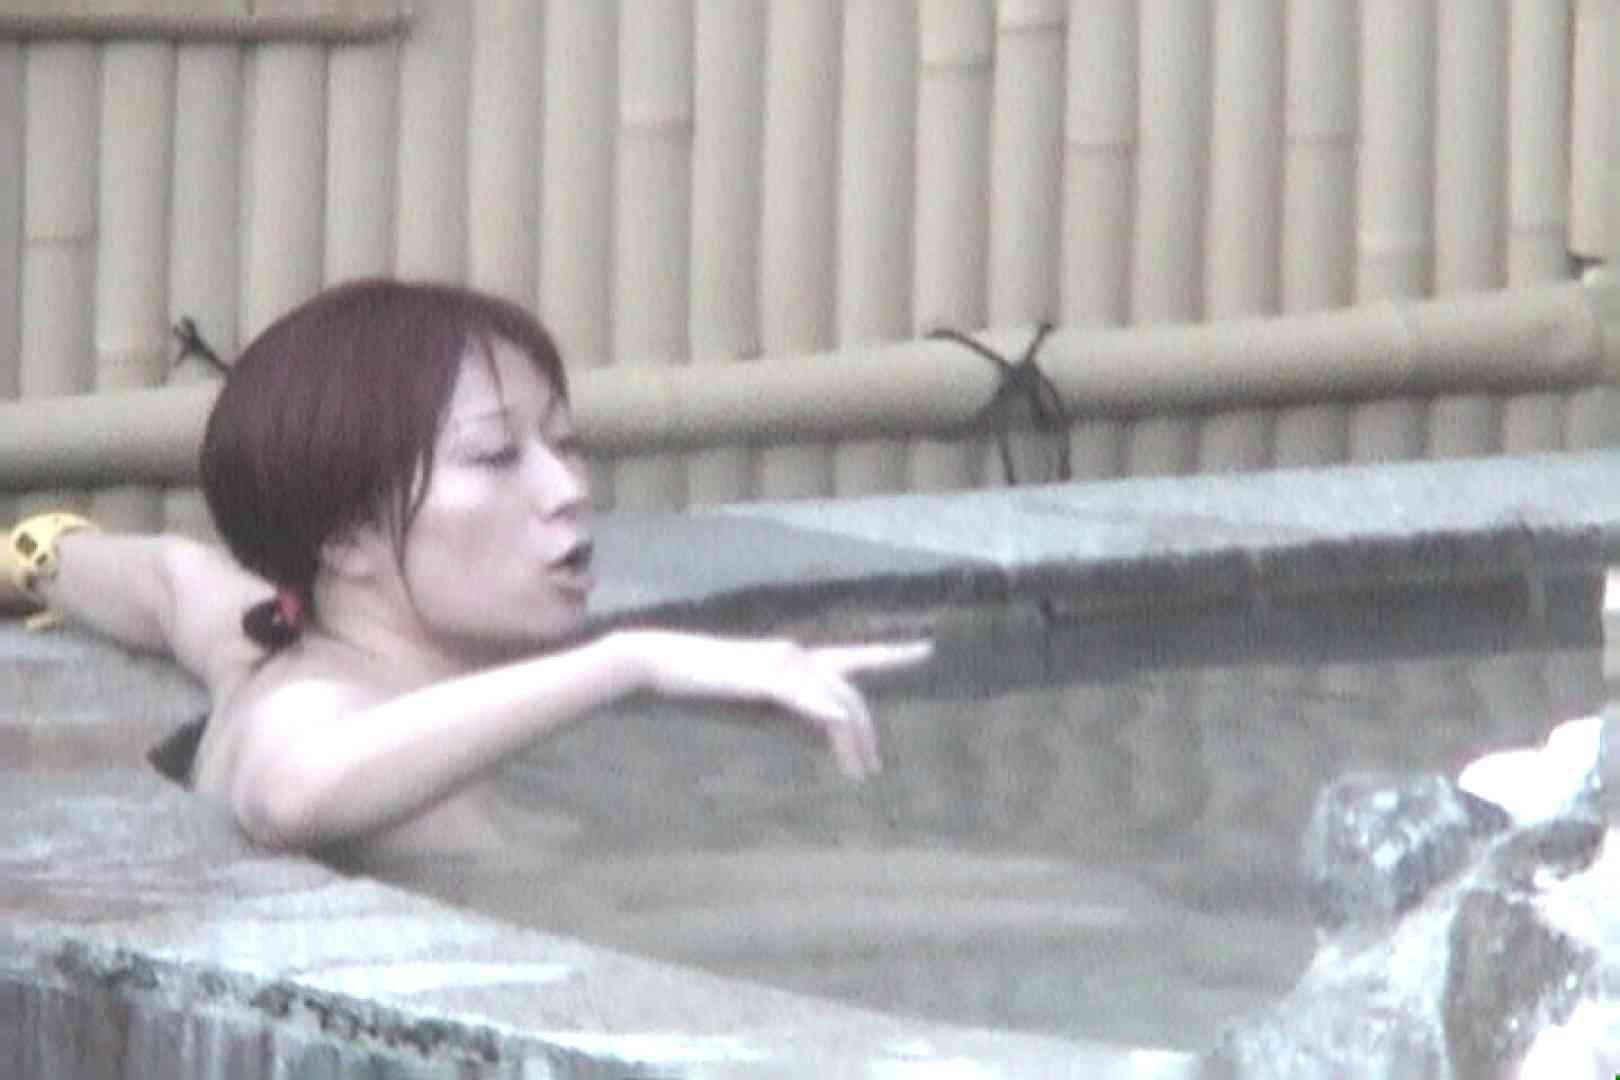 Aquaな露天風呂Vol.561 エッチな盗撮 セックス画像 80pic 53